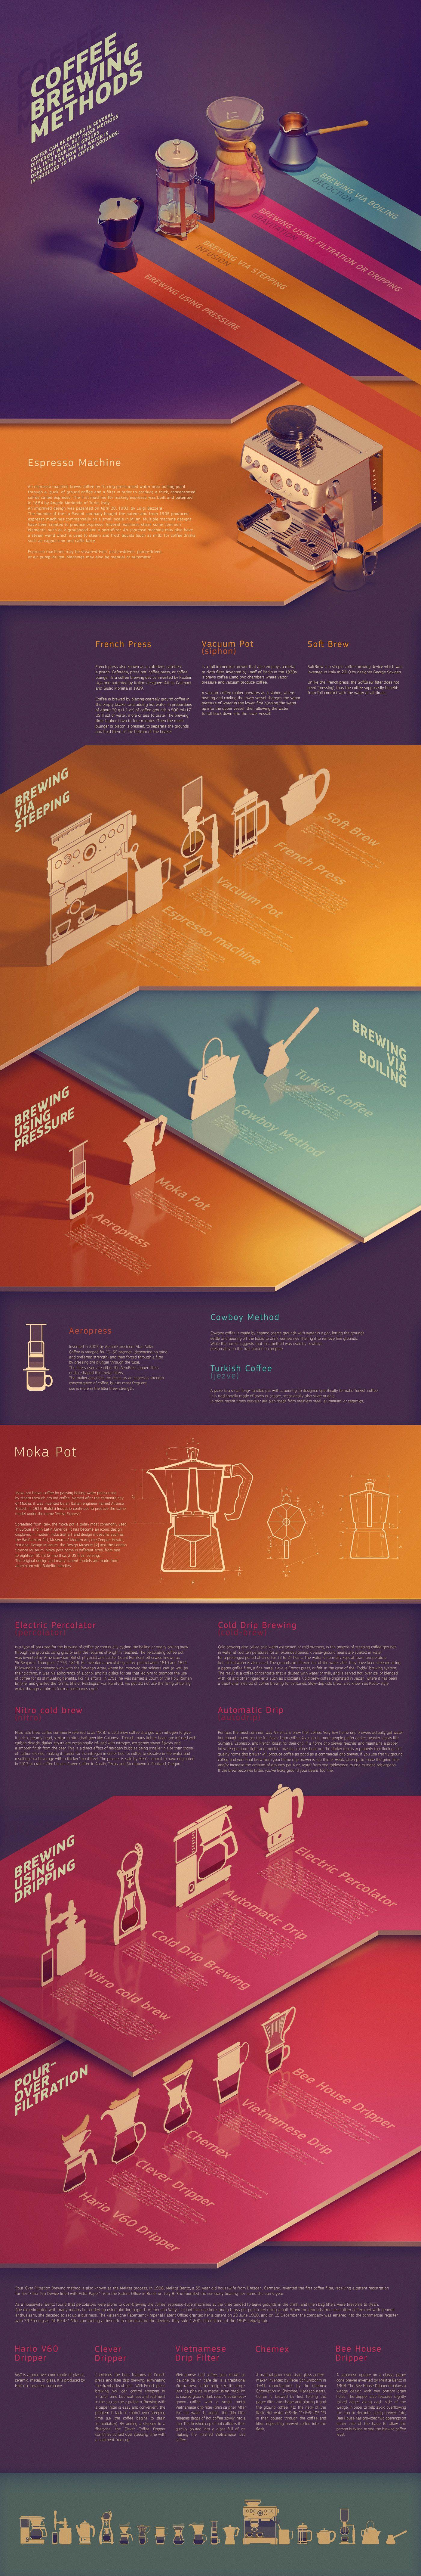 Coffee Brewing Methods On Behance Coffee Brewing Methods Coffee